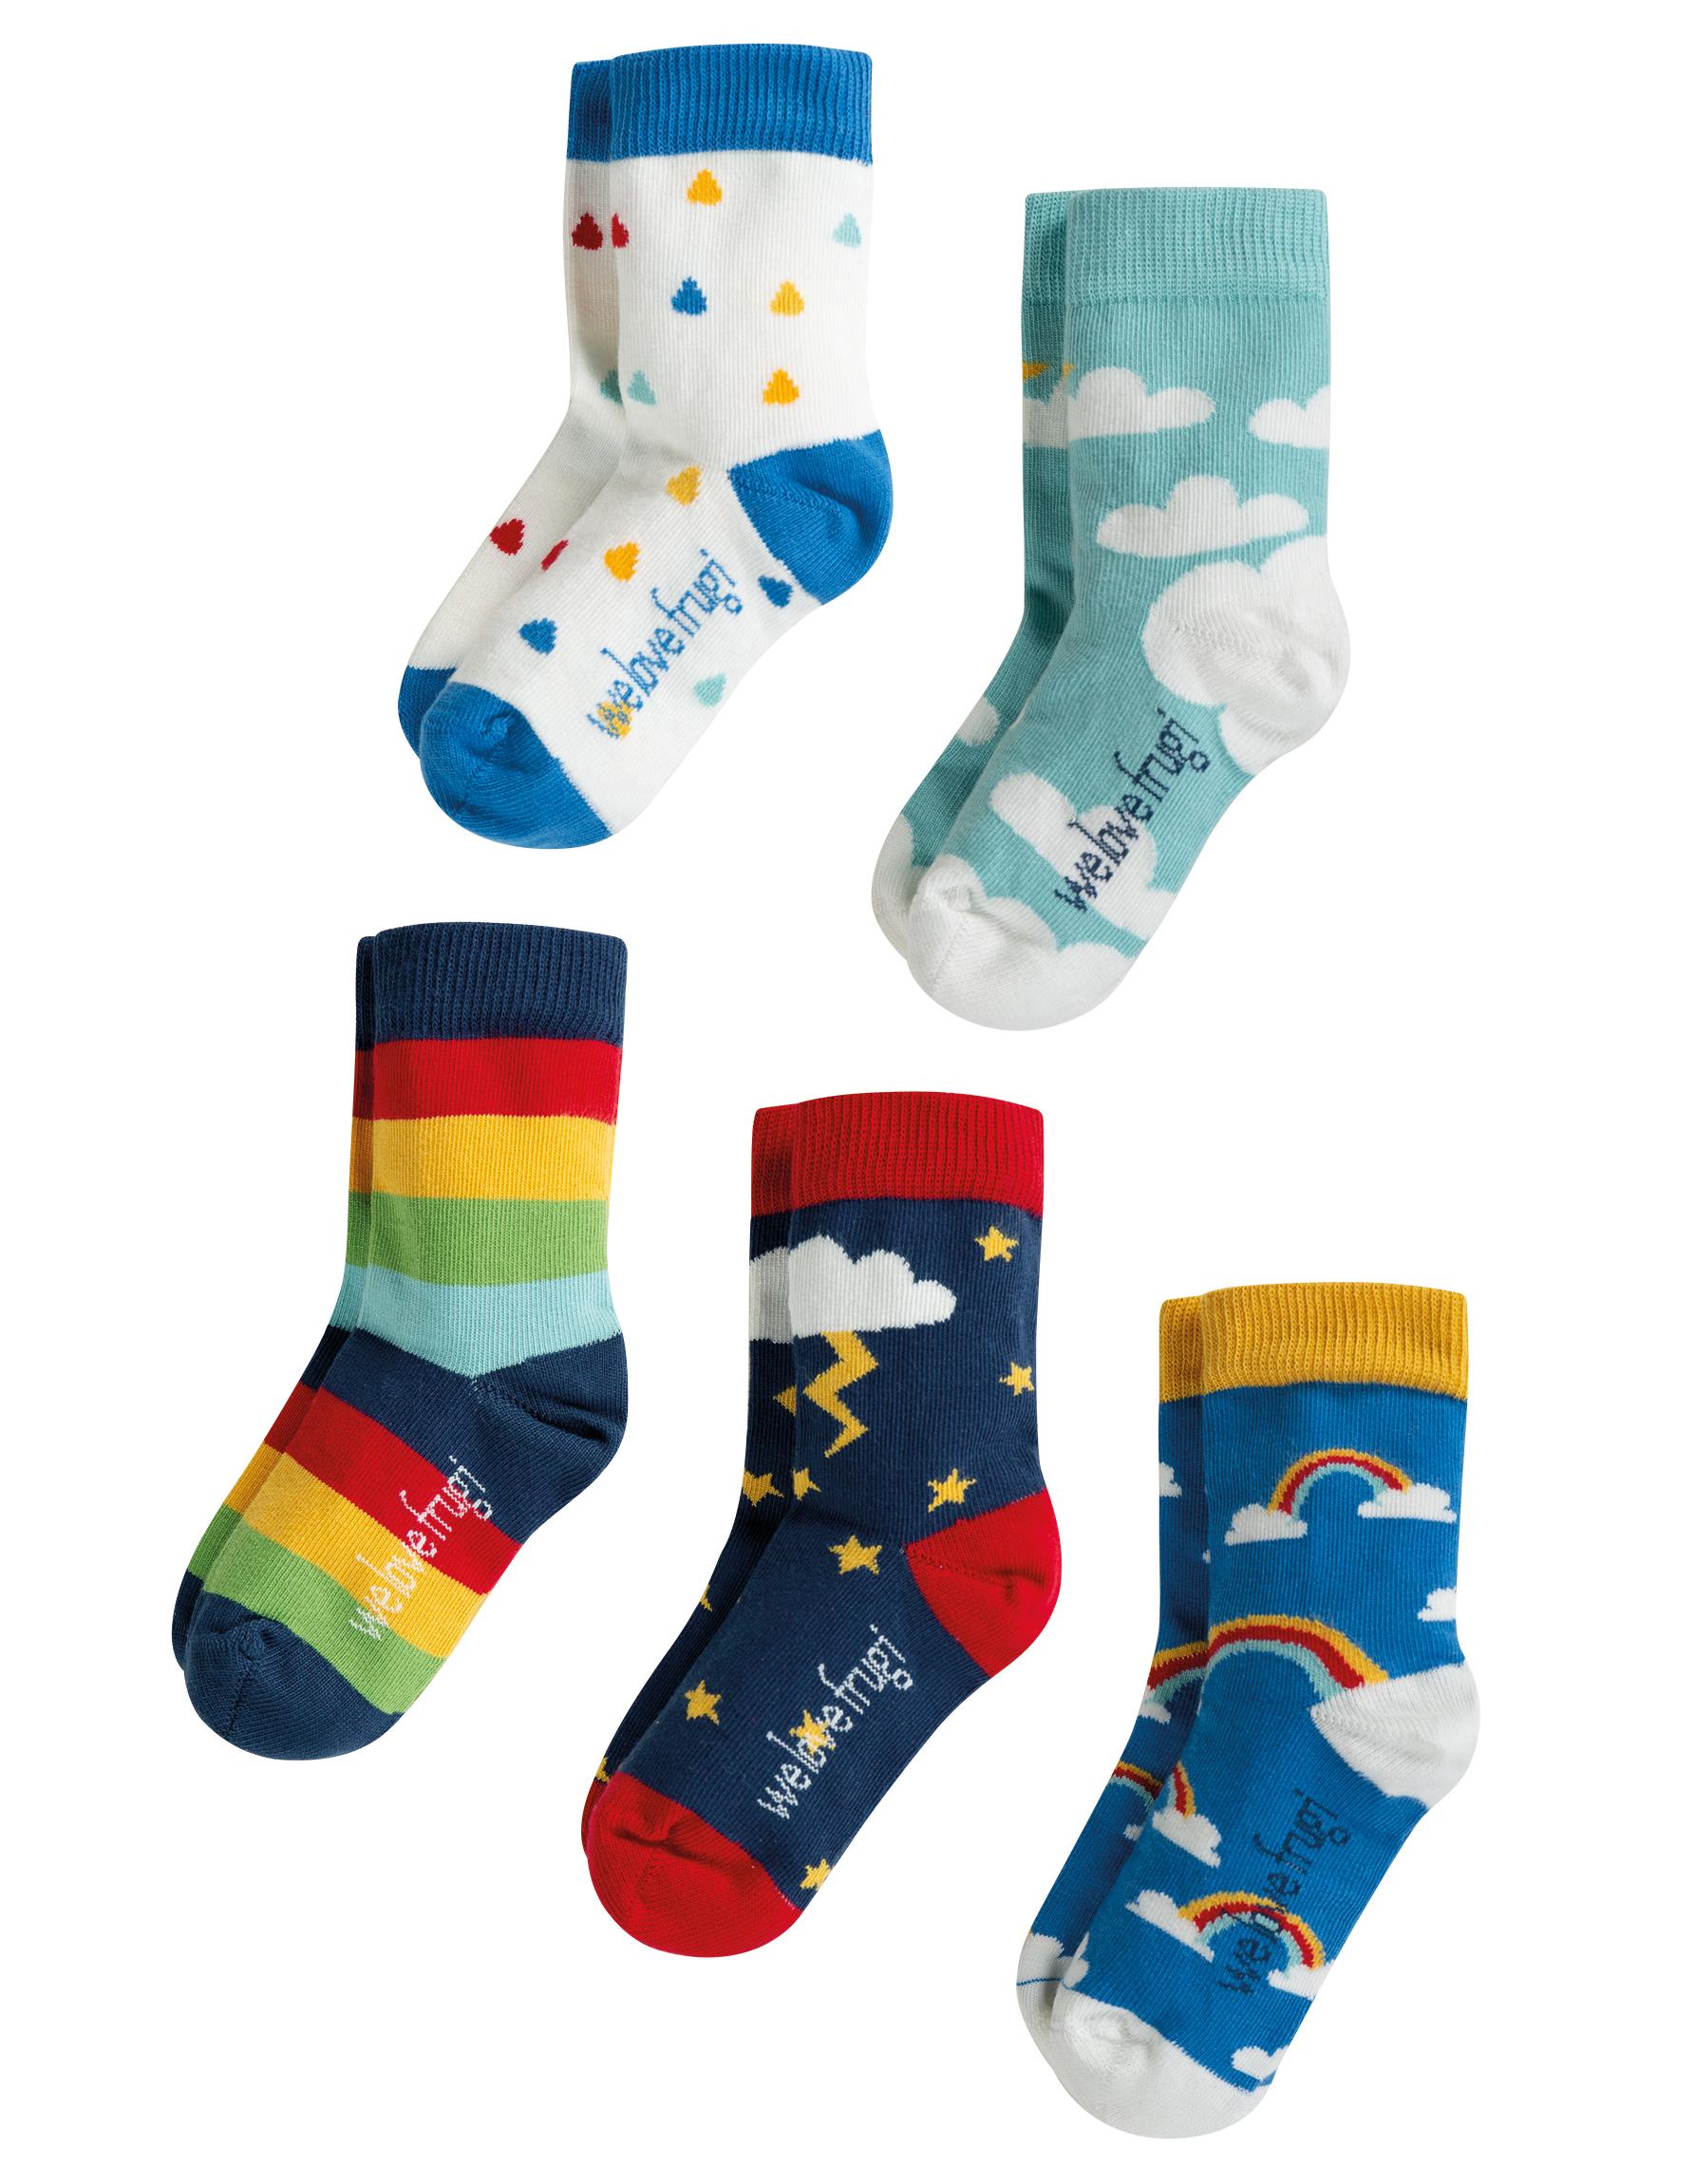 Frugi - Socks in a box Weather multipack